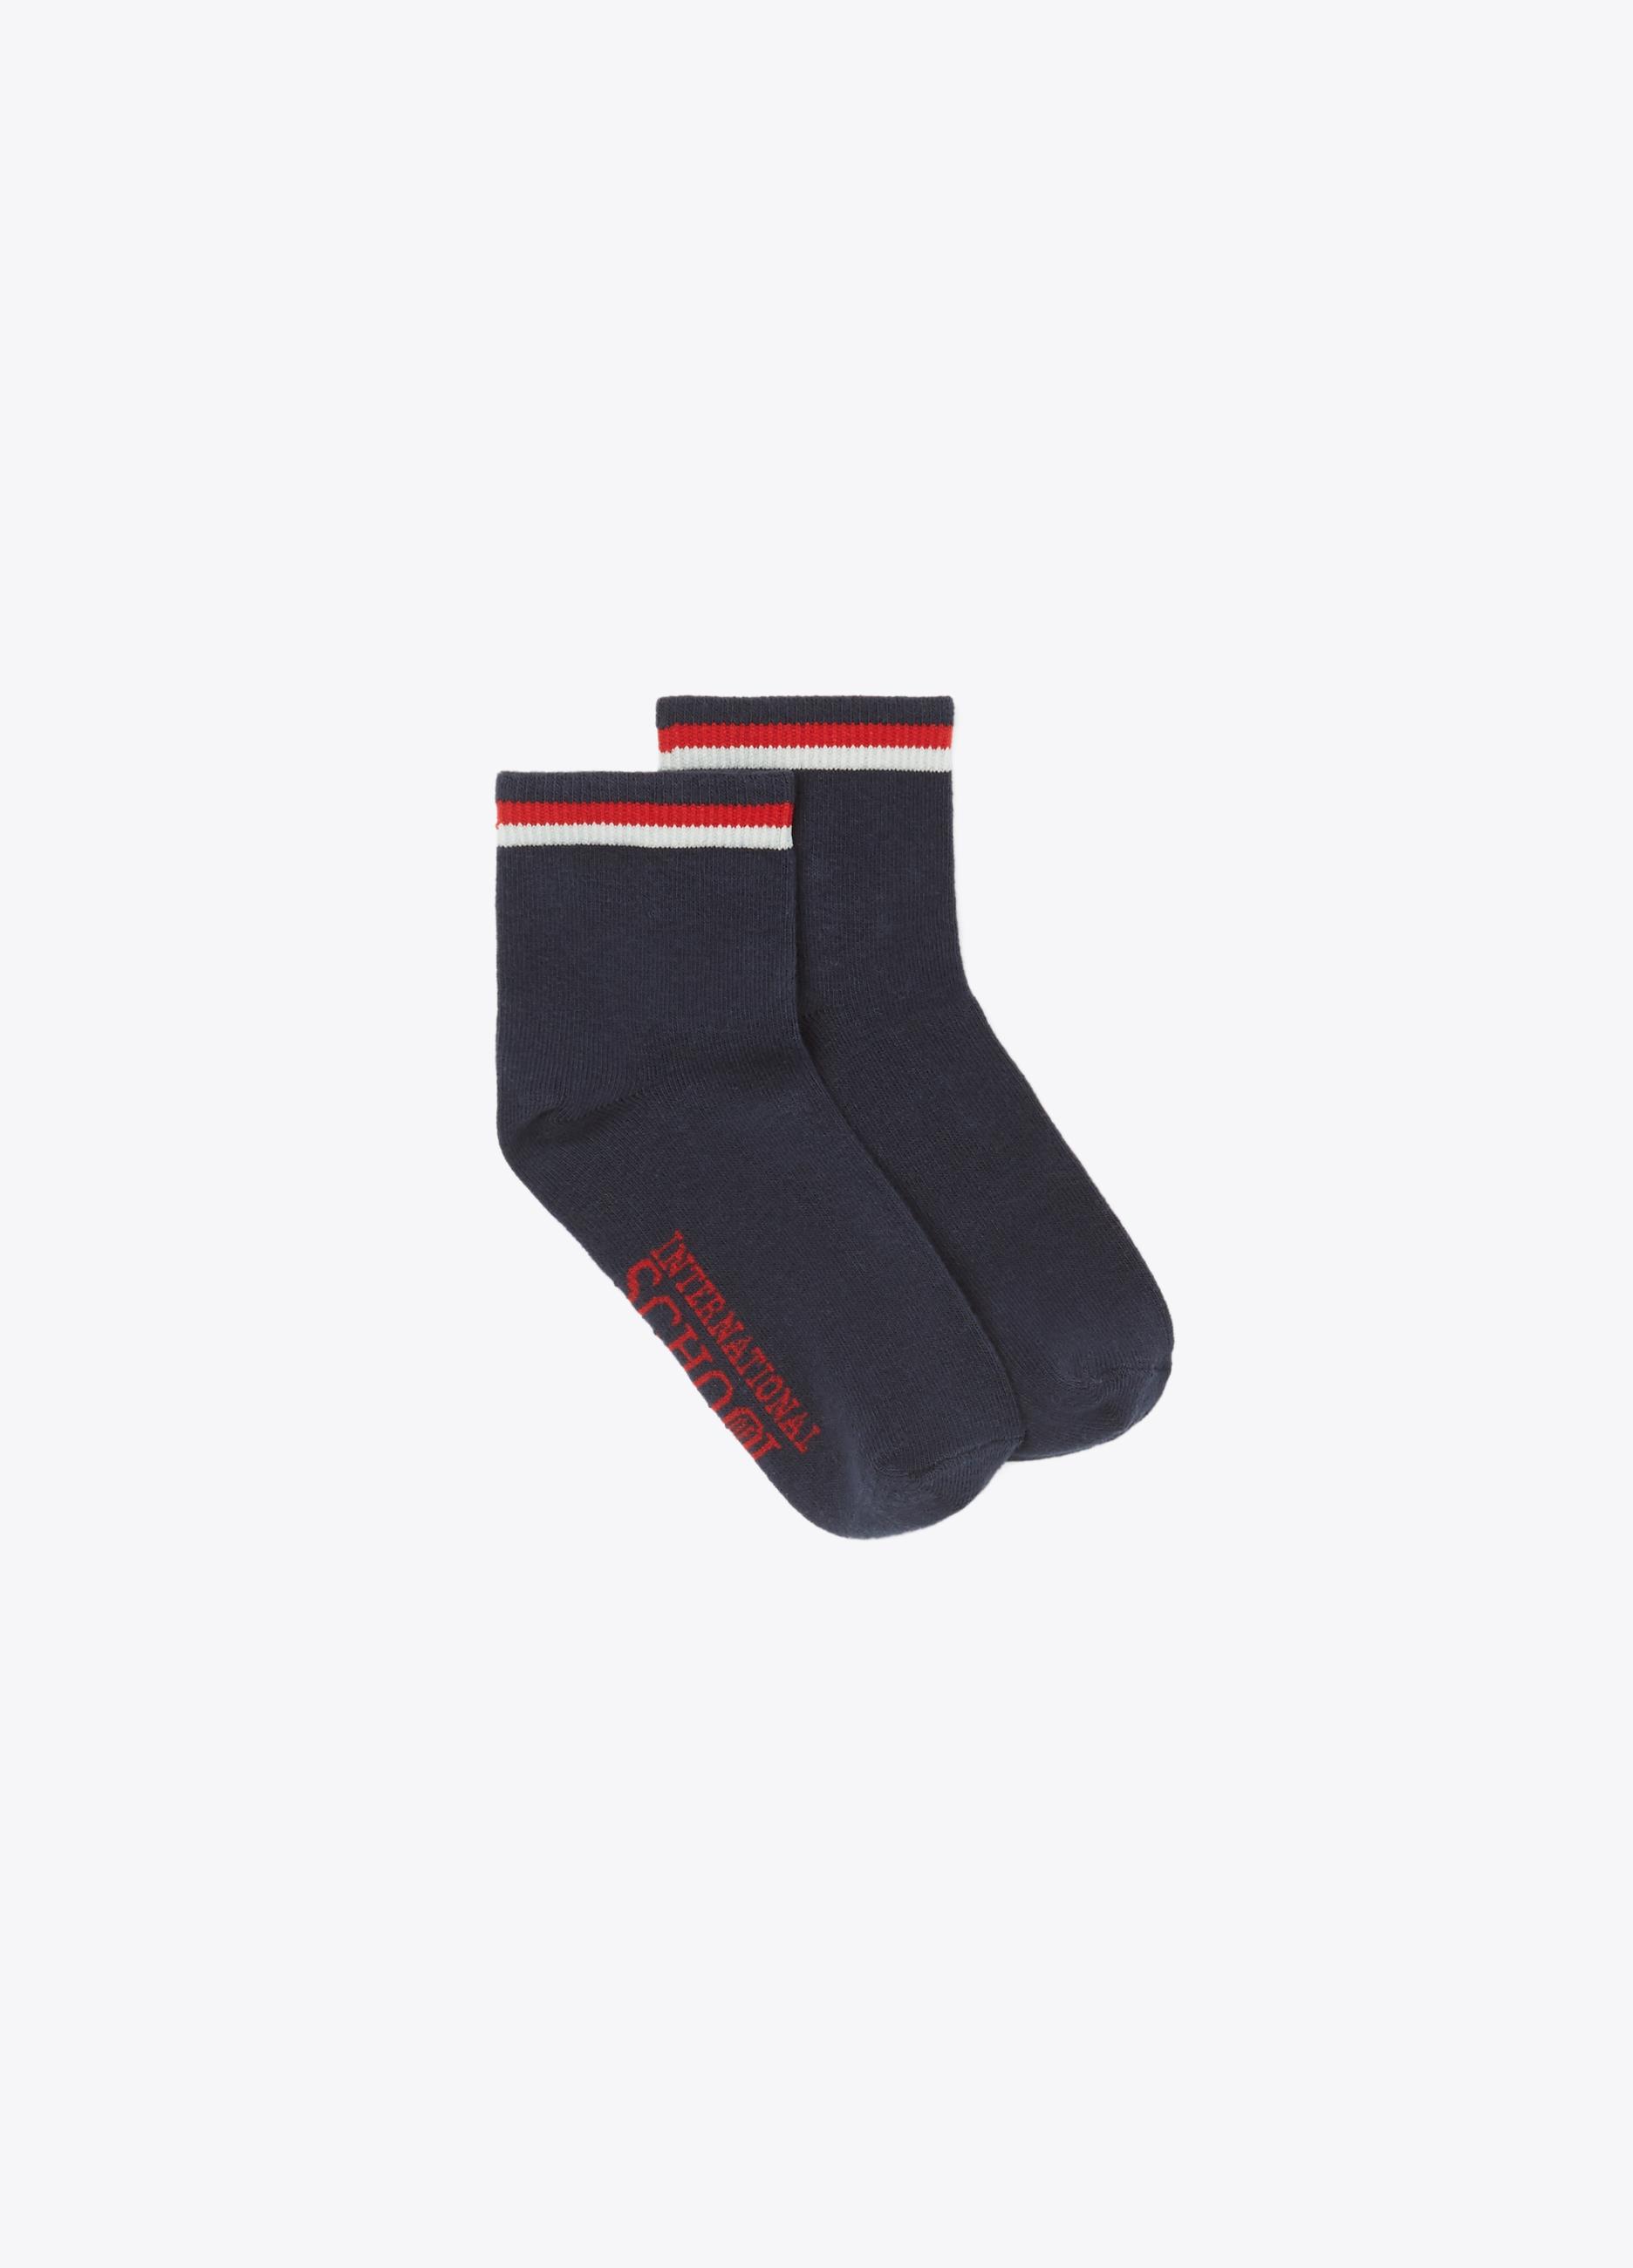 Short stretch socks with ribbing